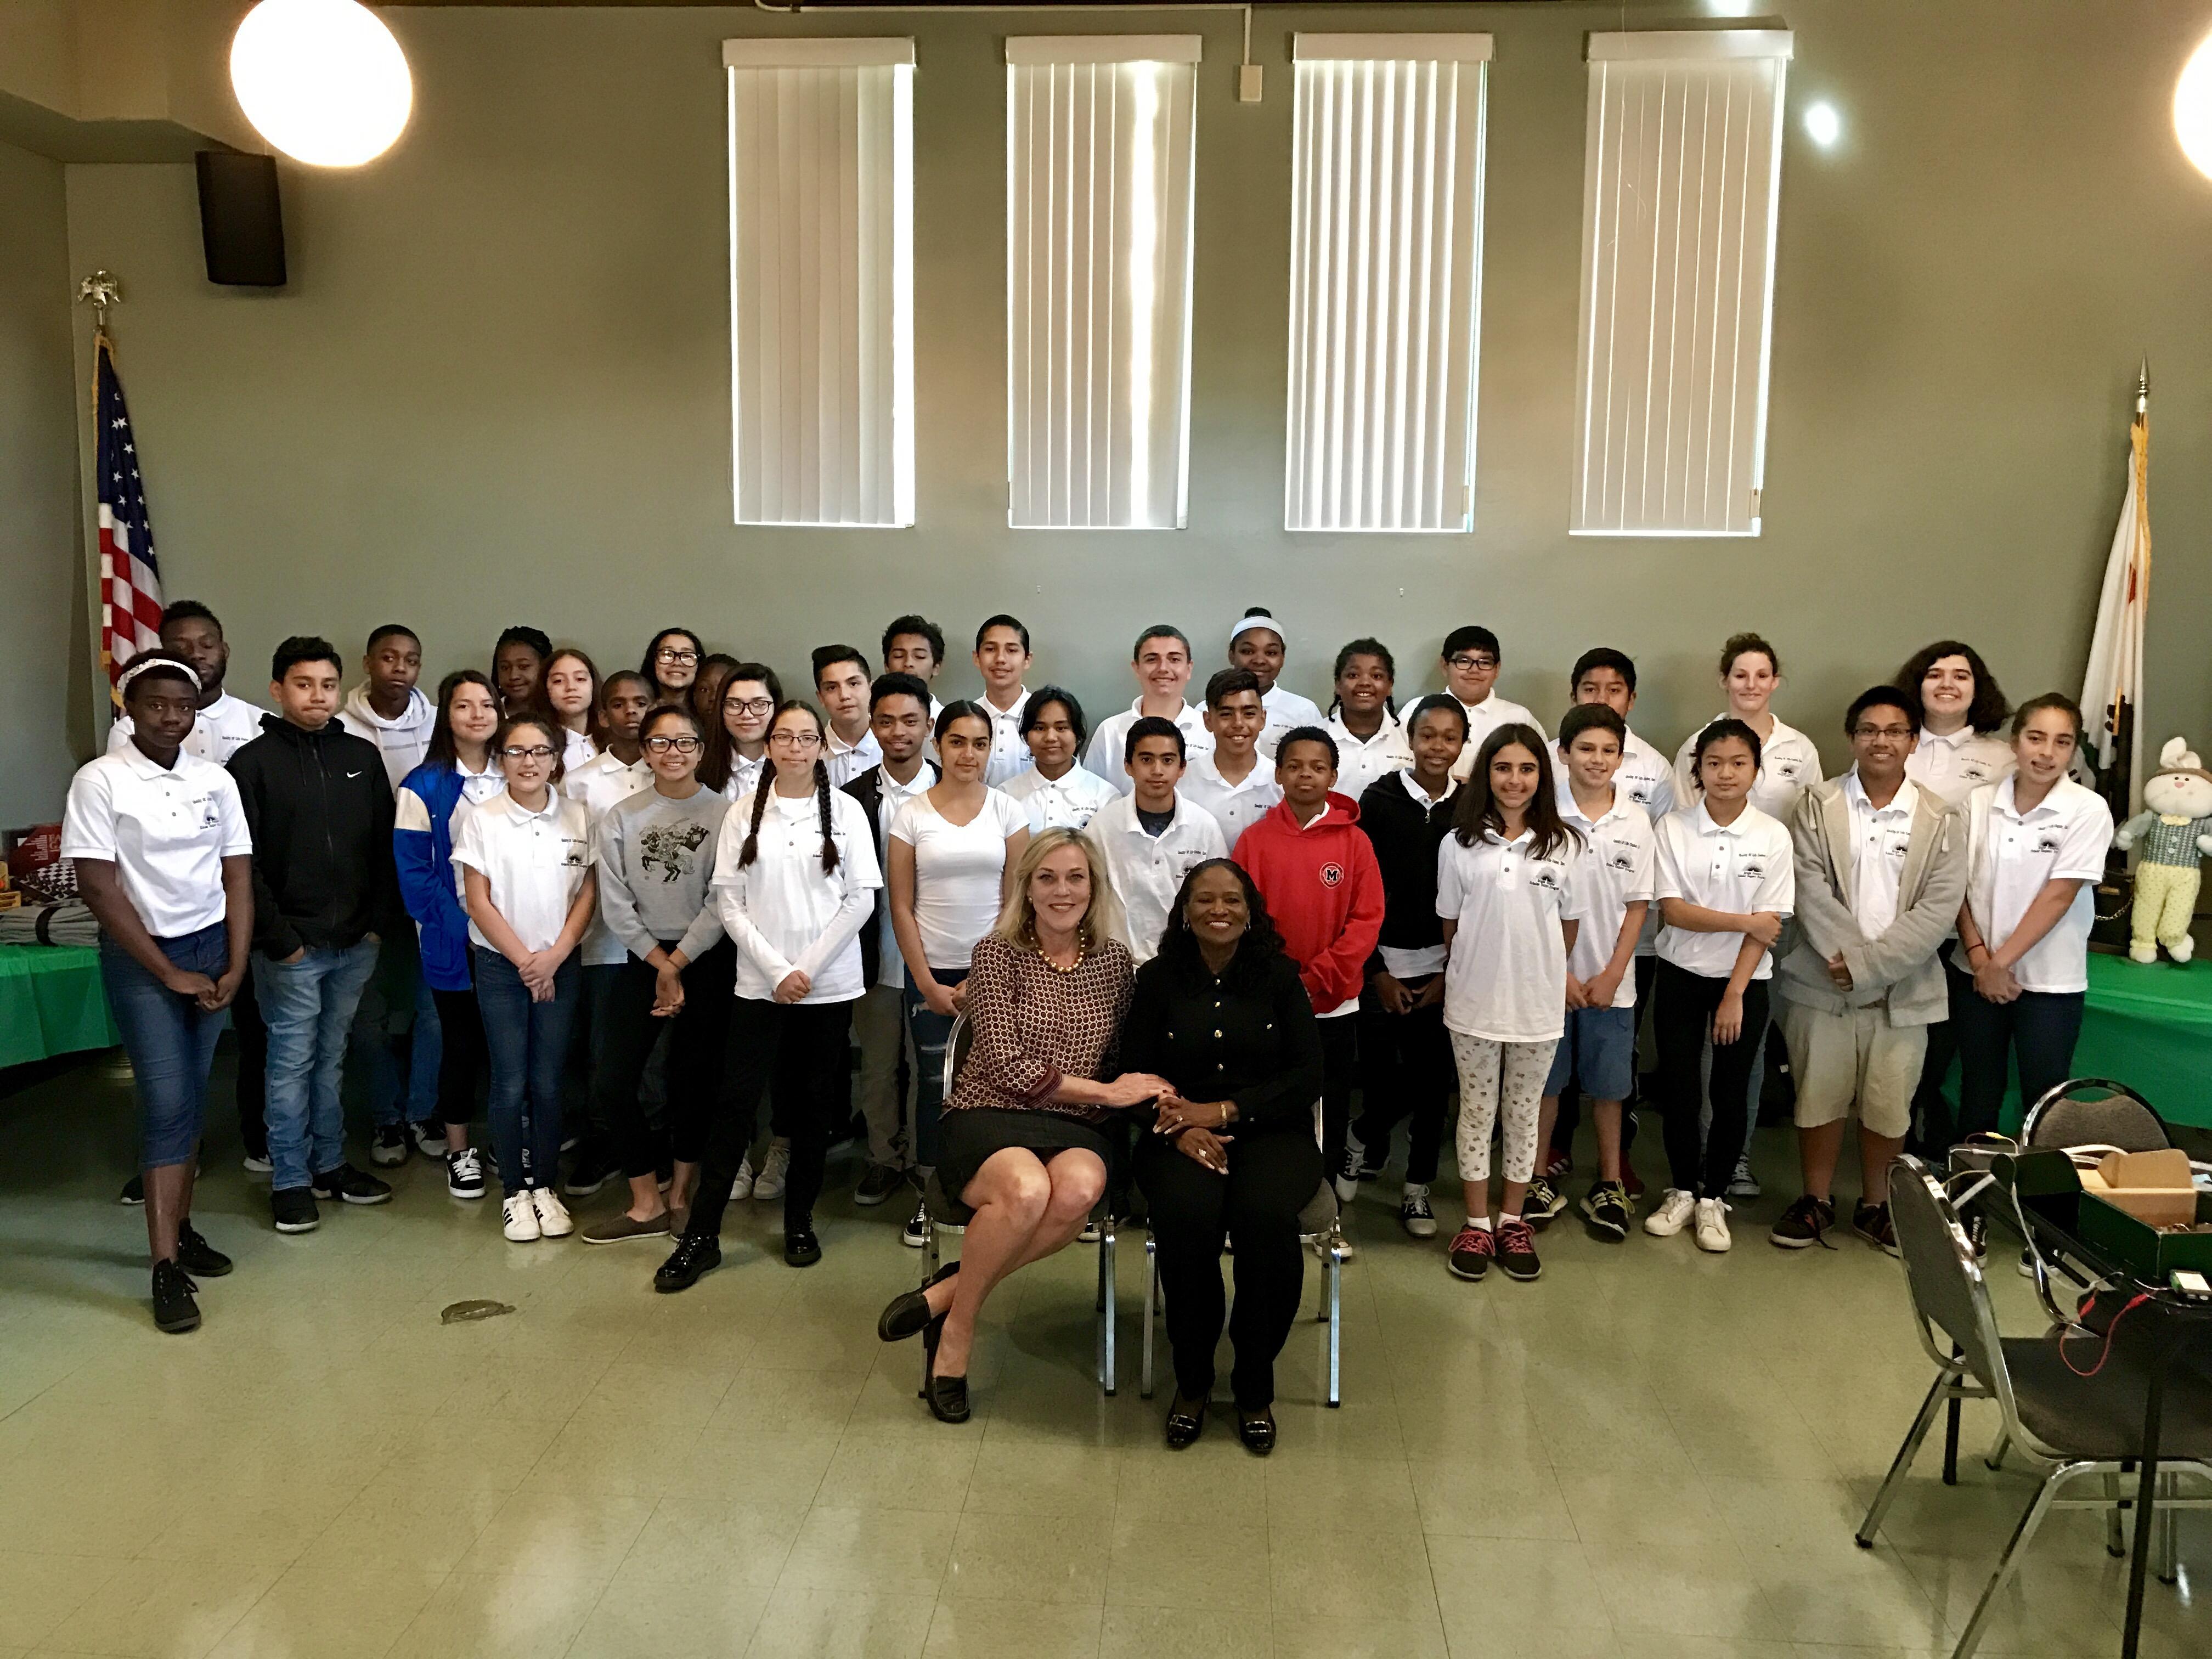 Bright Future Scholars – Supervisor Kathryn Barger